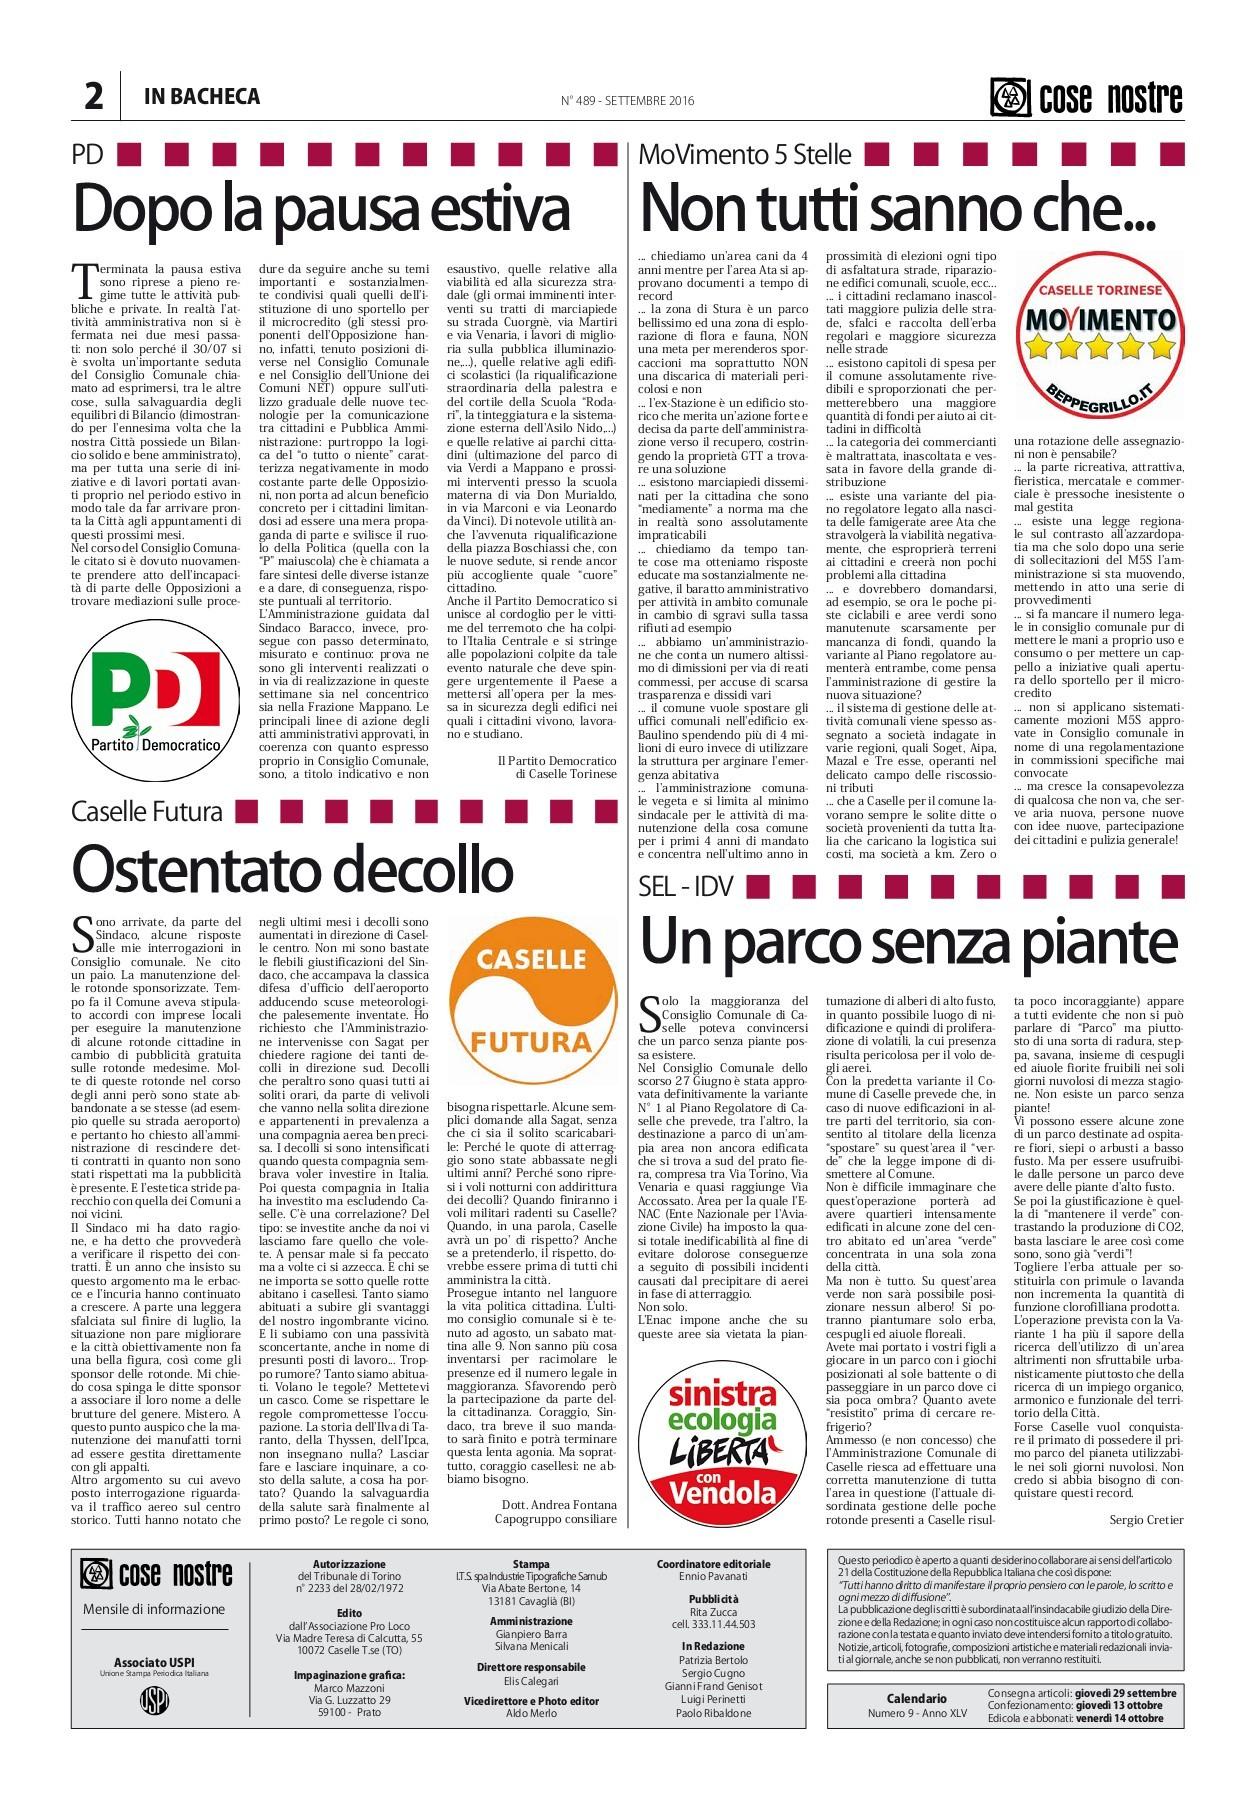 Italia Arreda Borgaro Torinese 2016_9_settembre-flip book pages 1-32 | pubhtml5